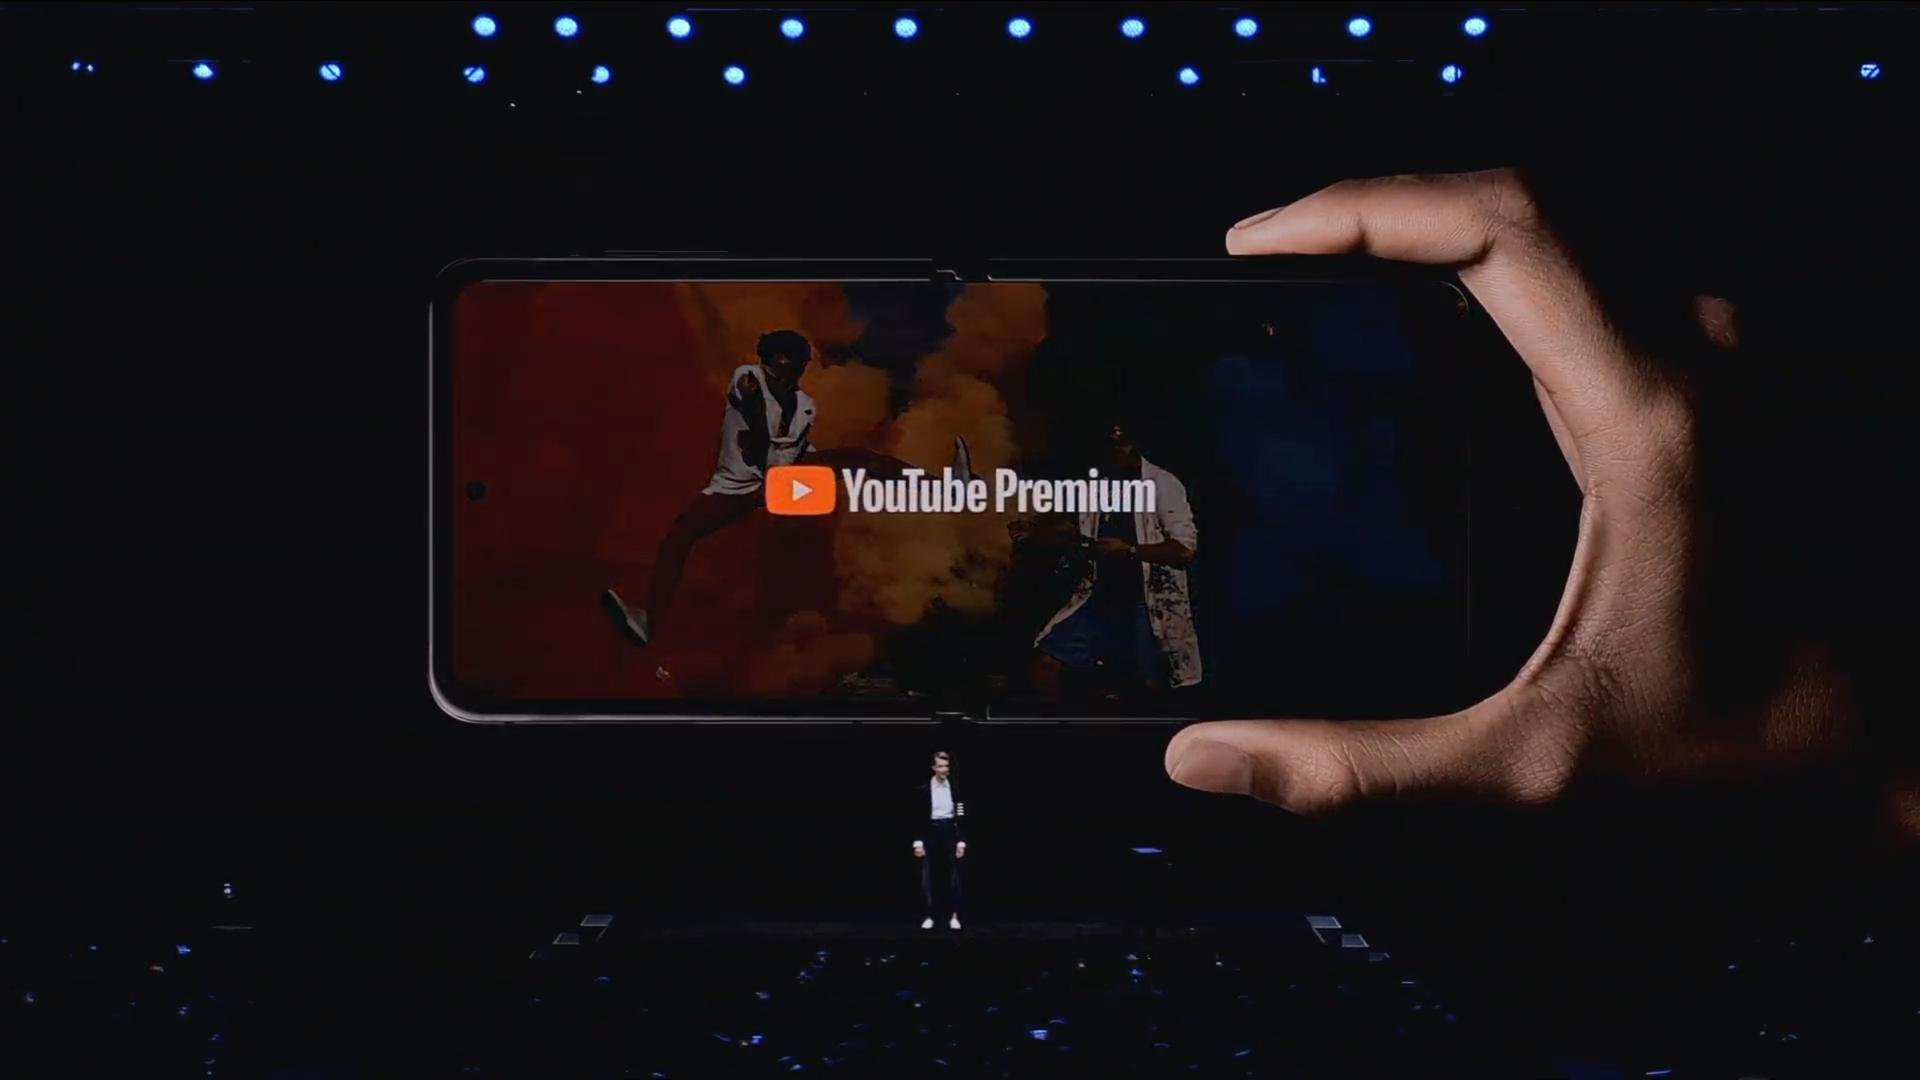 Z Flip YouTube Premium Samsung Unpacked 2020